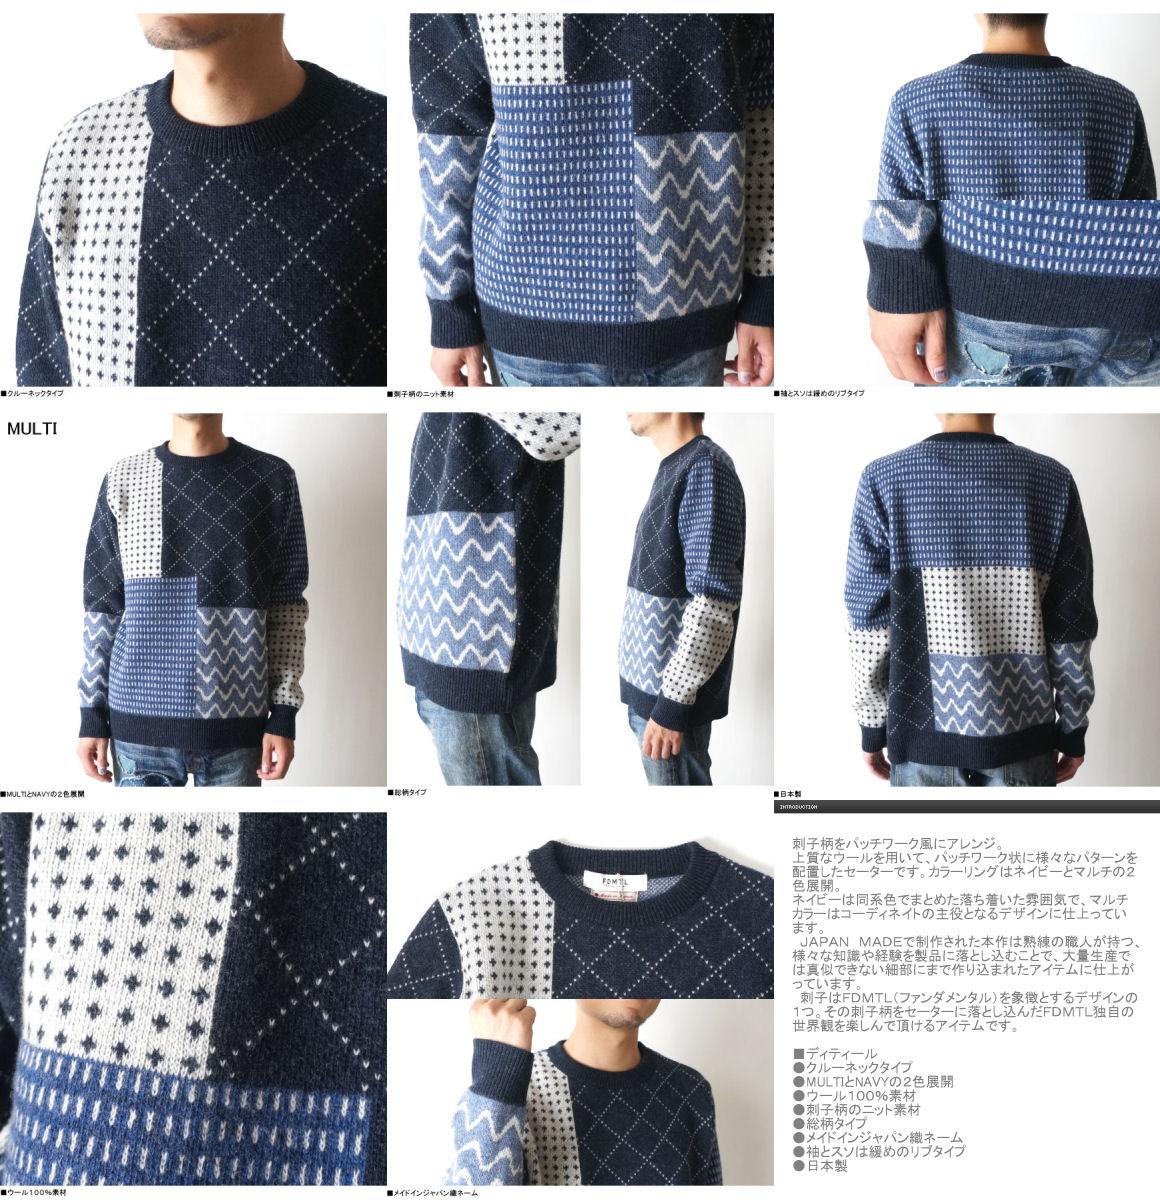 Nt11ml SASHIKO CREW NECK SWEATER MULTI 刺子 패턴 크루 넥 스웨터 멀티 컬러